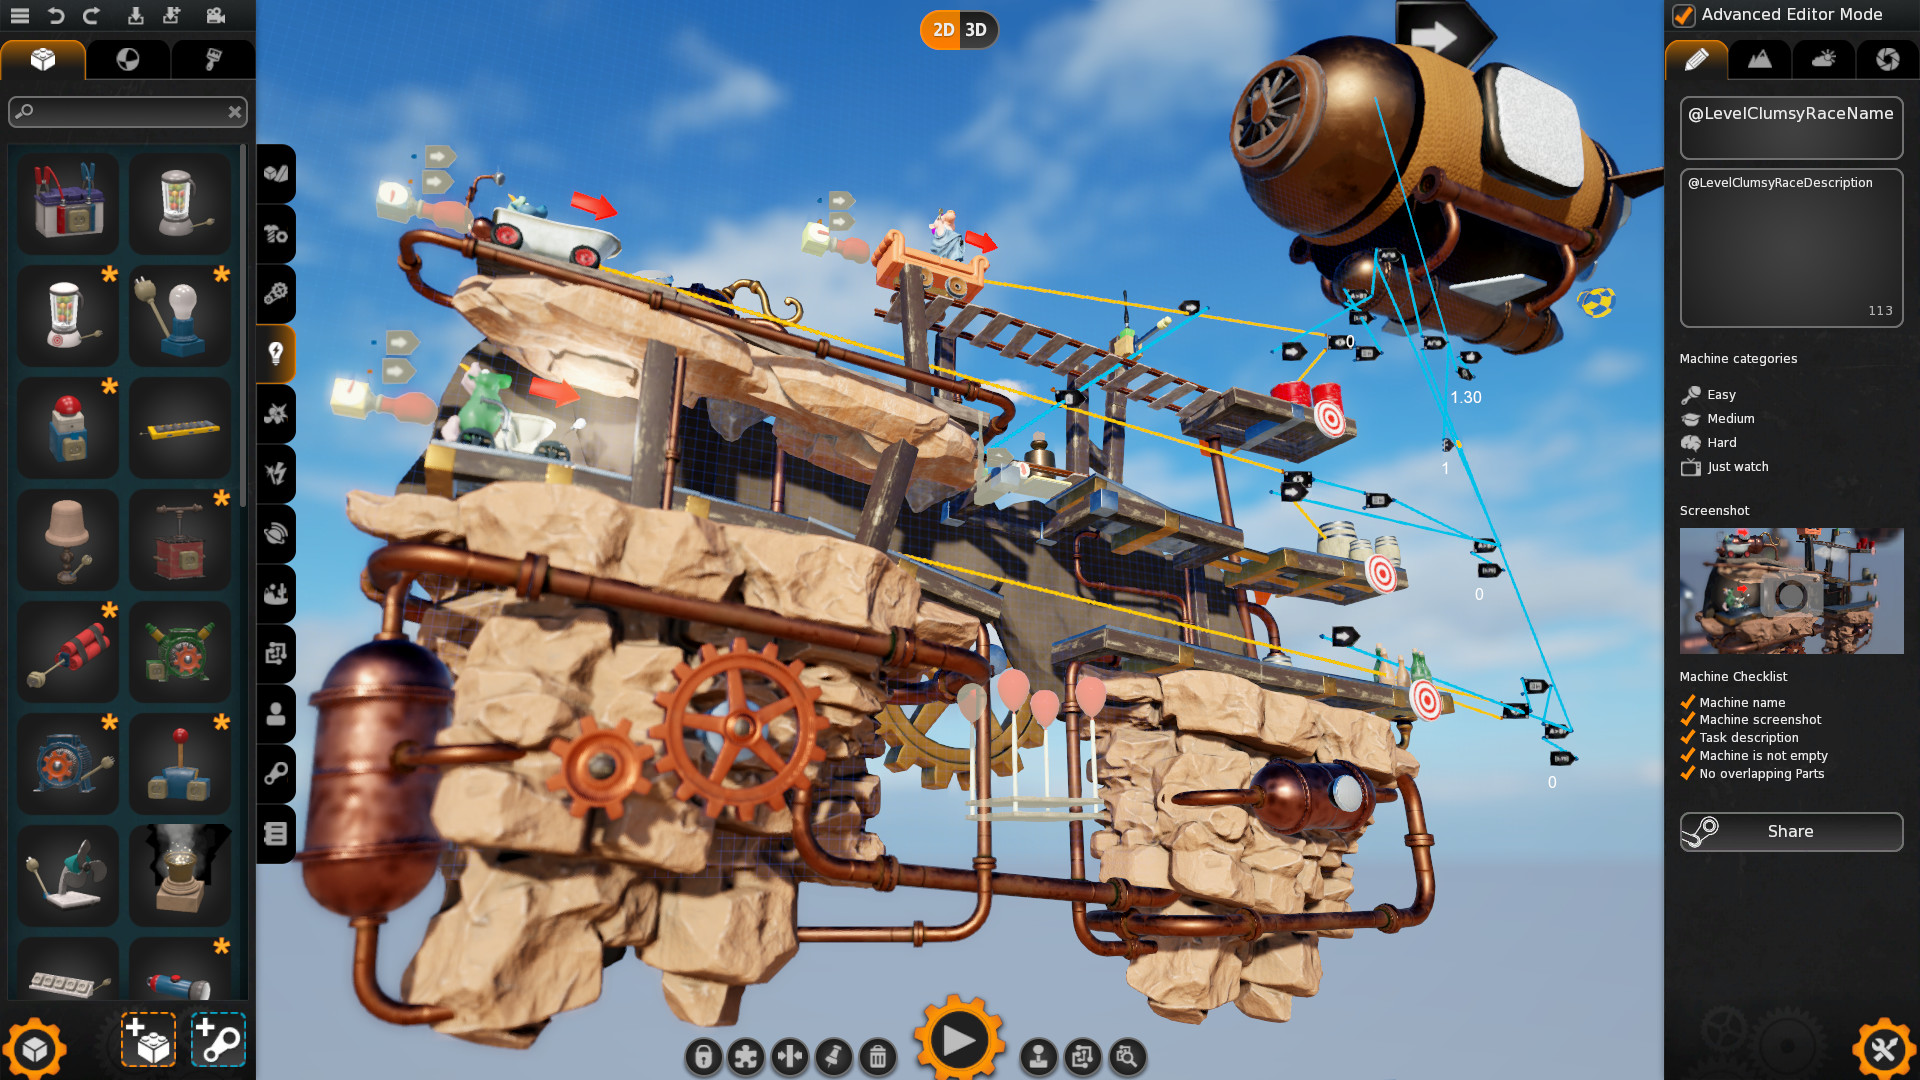 Crazy Machines 3 Screenshot 3